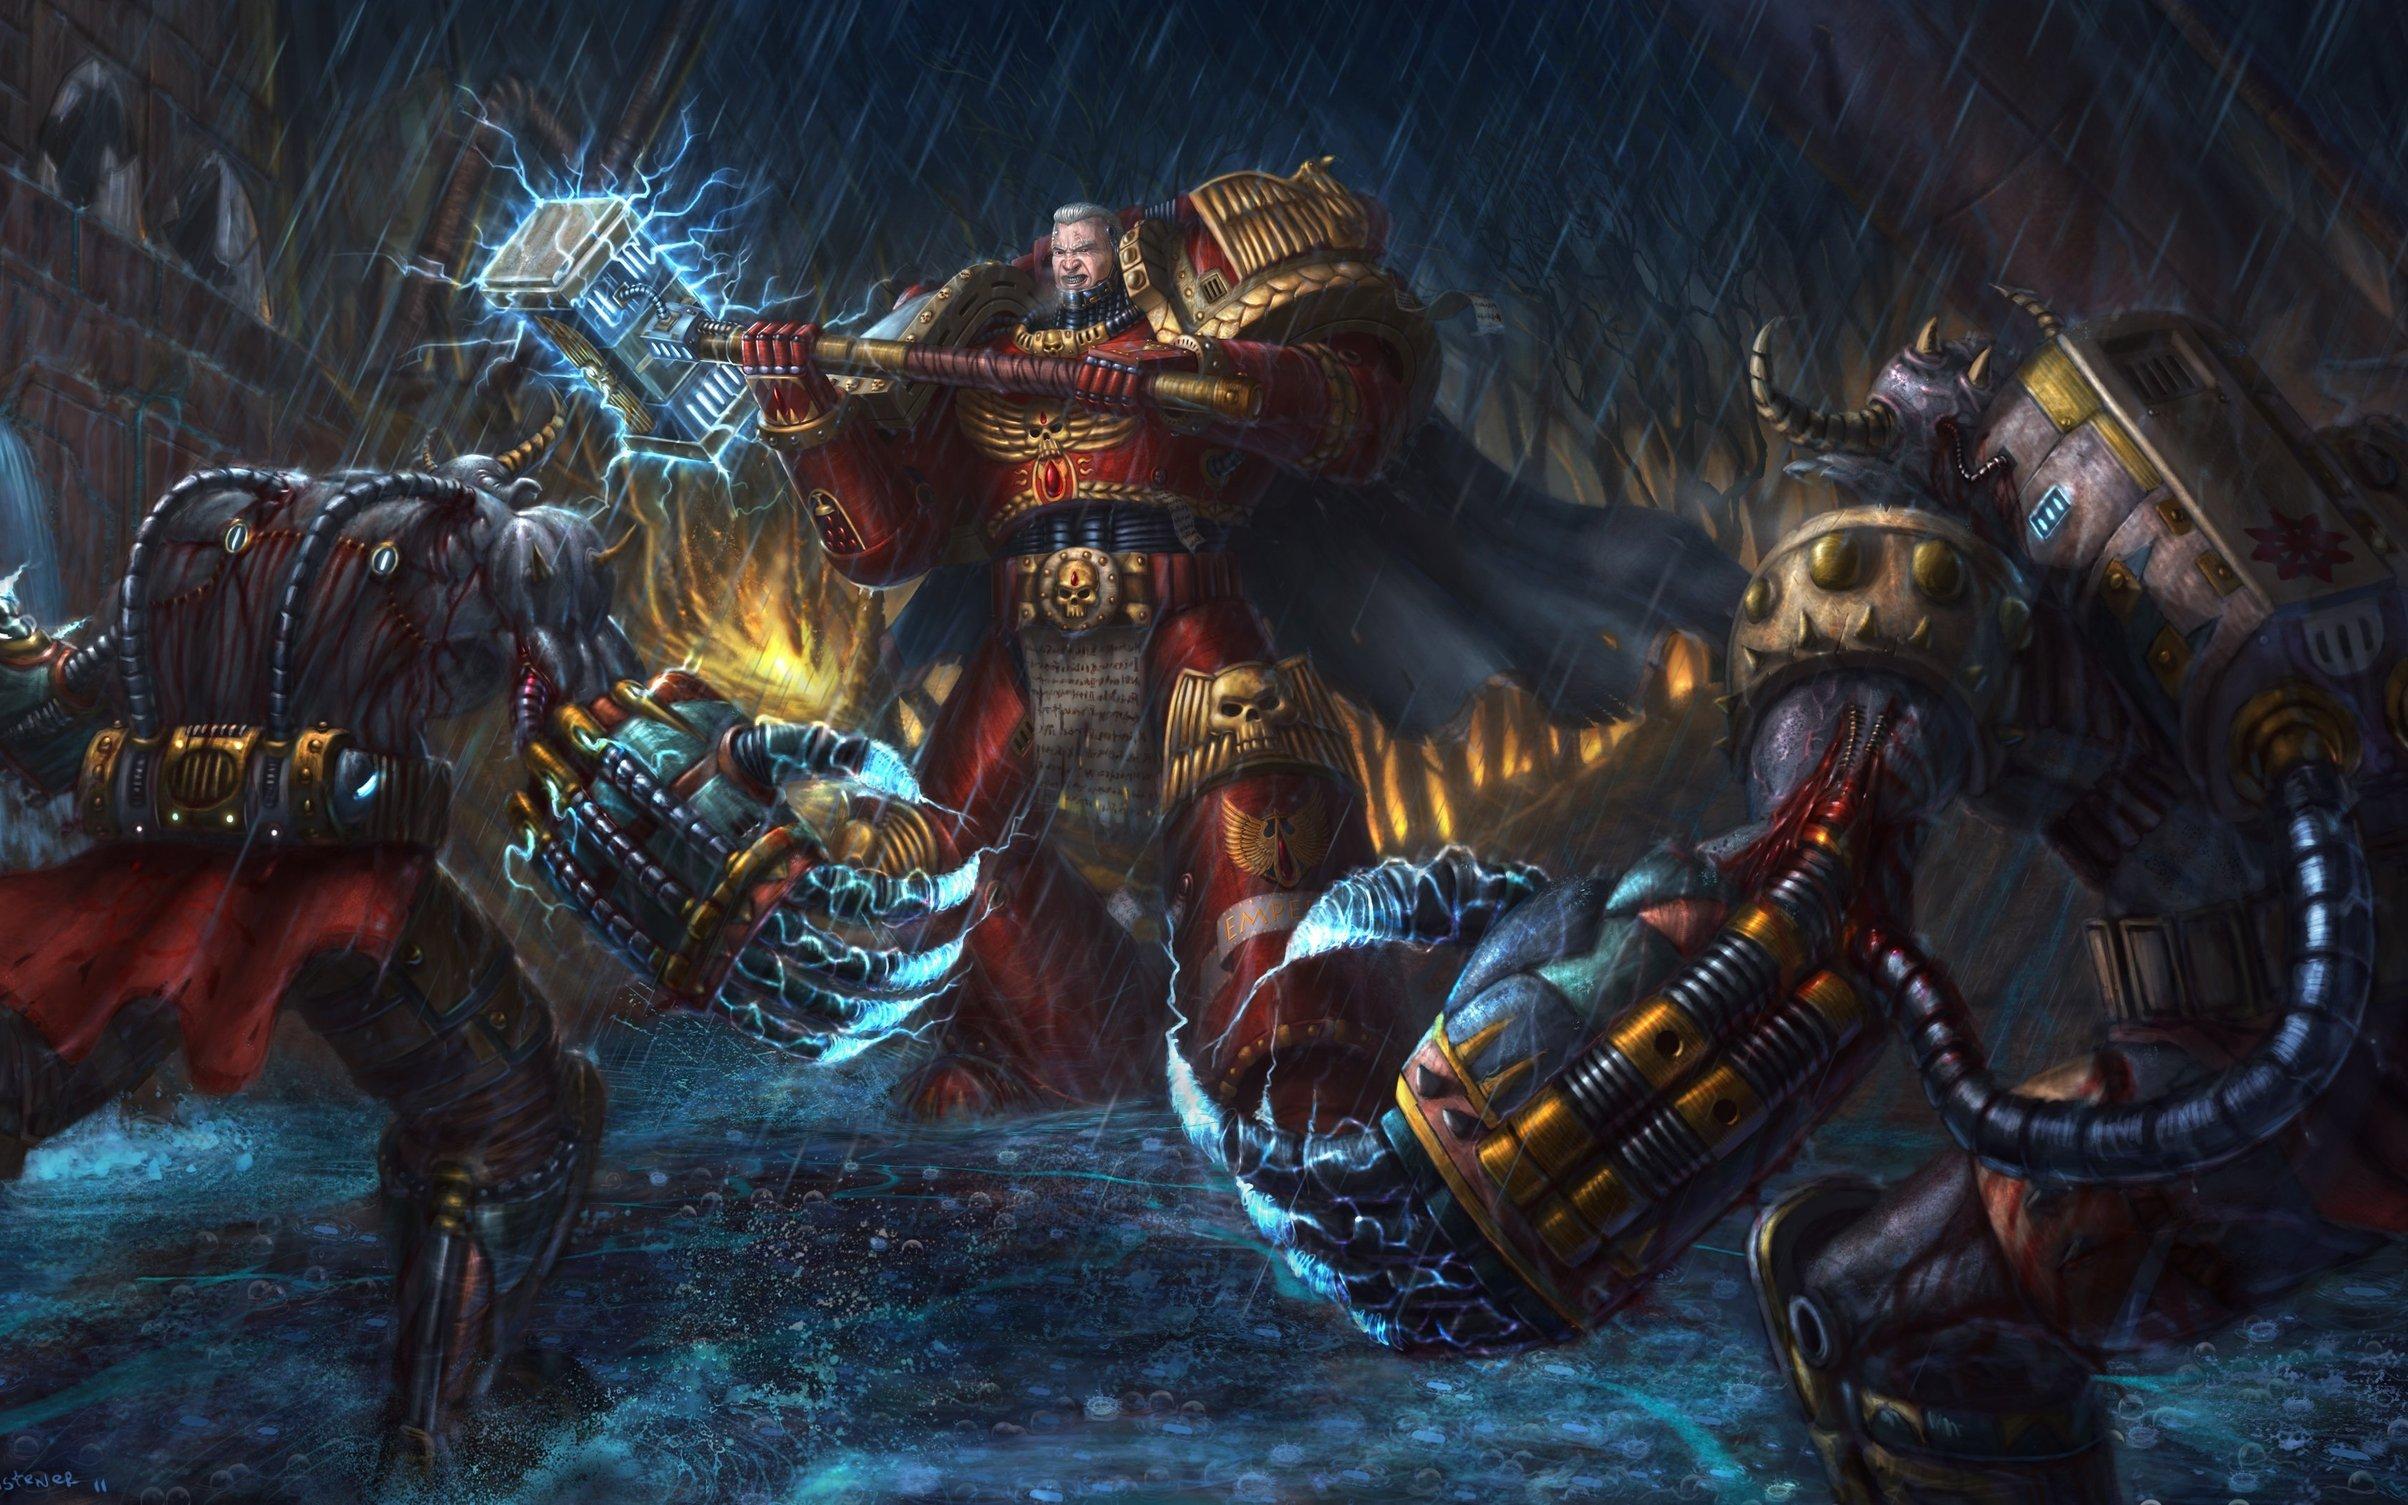 Warhammer 40k death company wallpaper - Blood Angels Captain Vs Something Librarium Pinterest Warhammer 40k